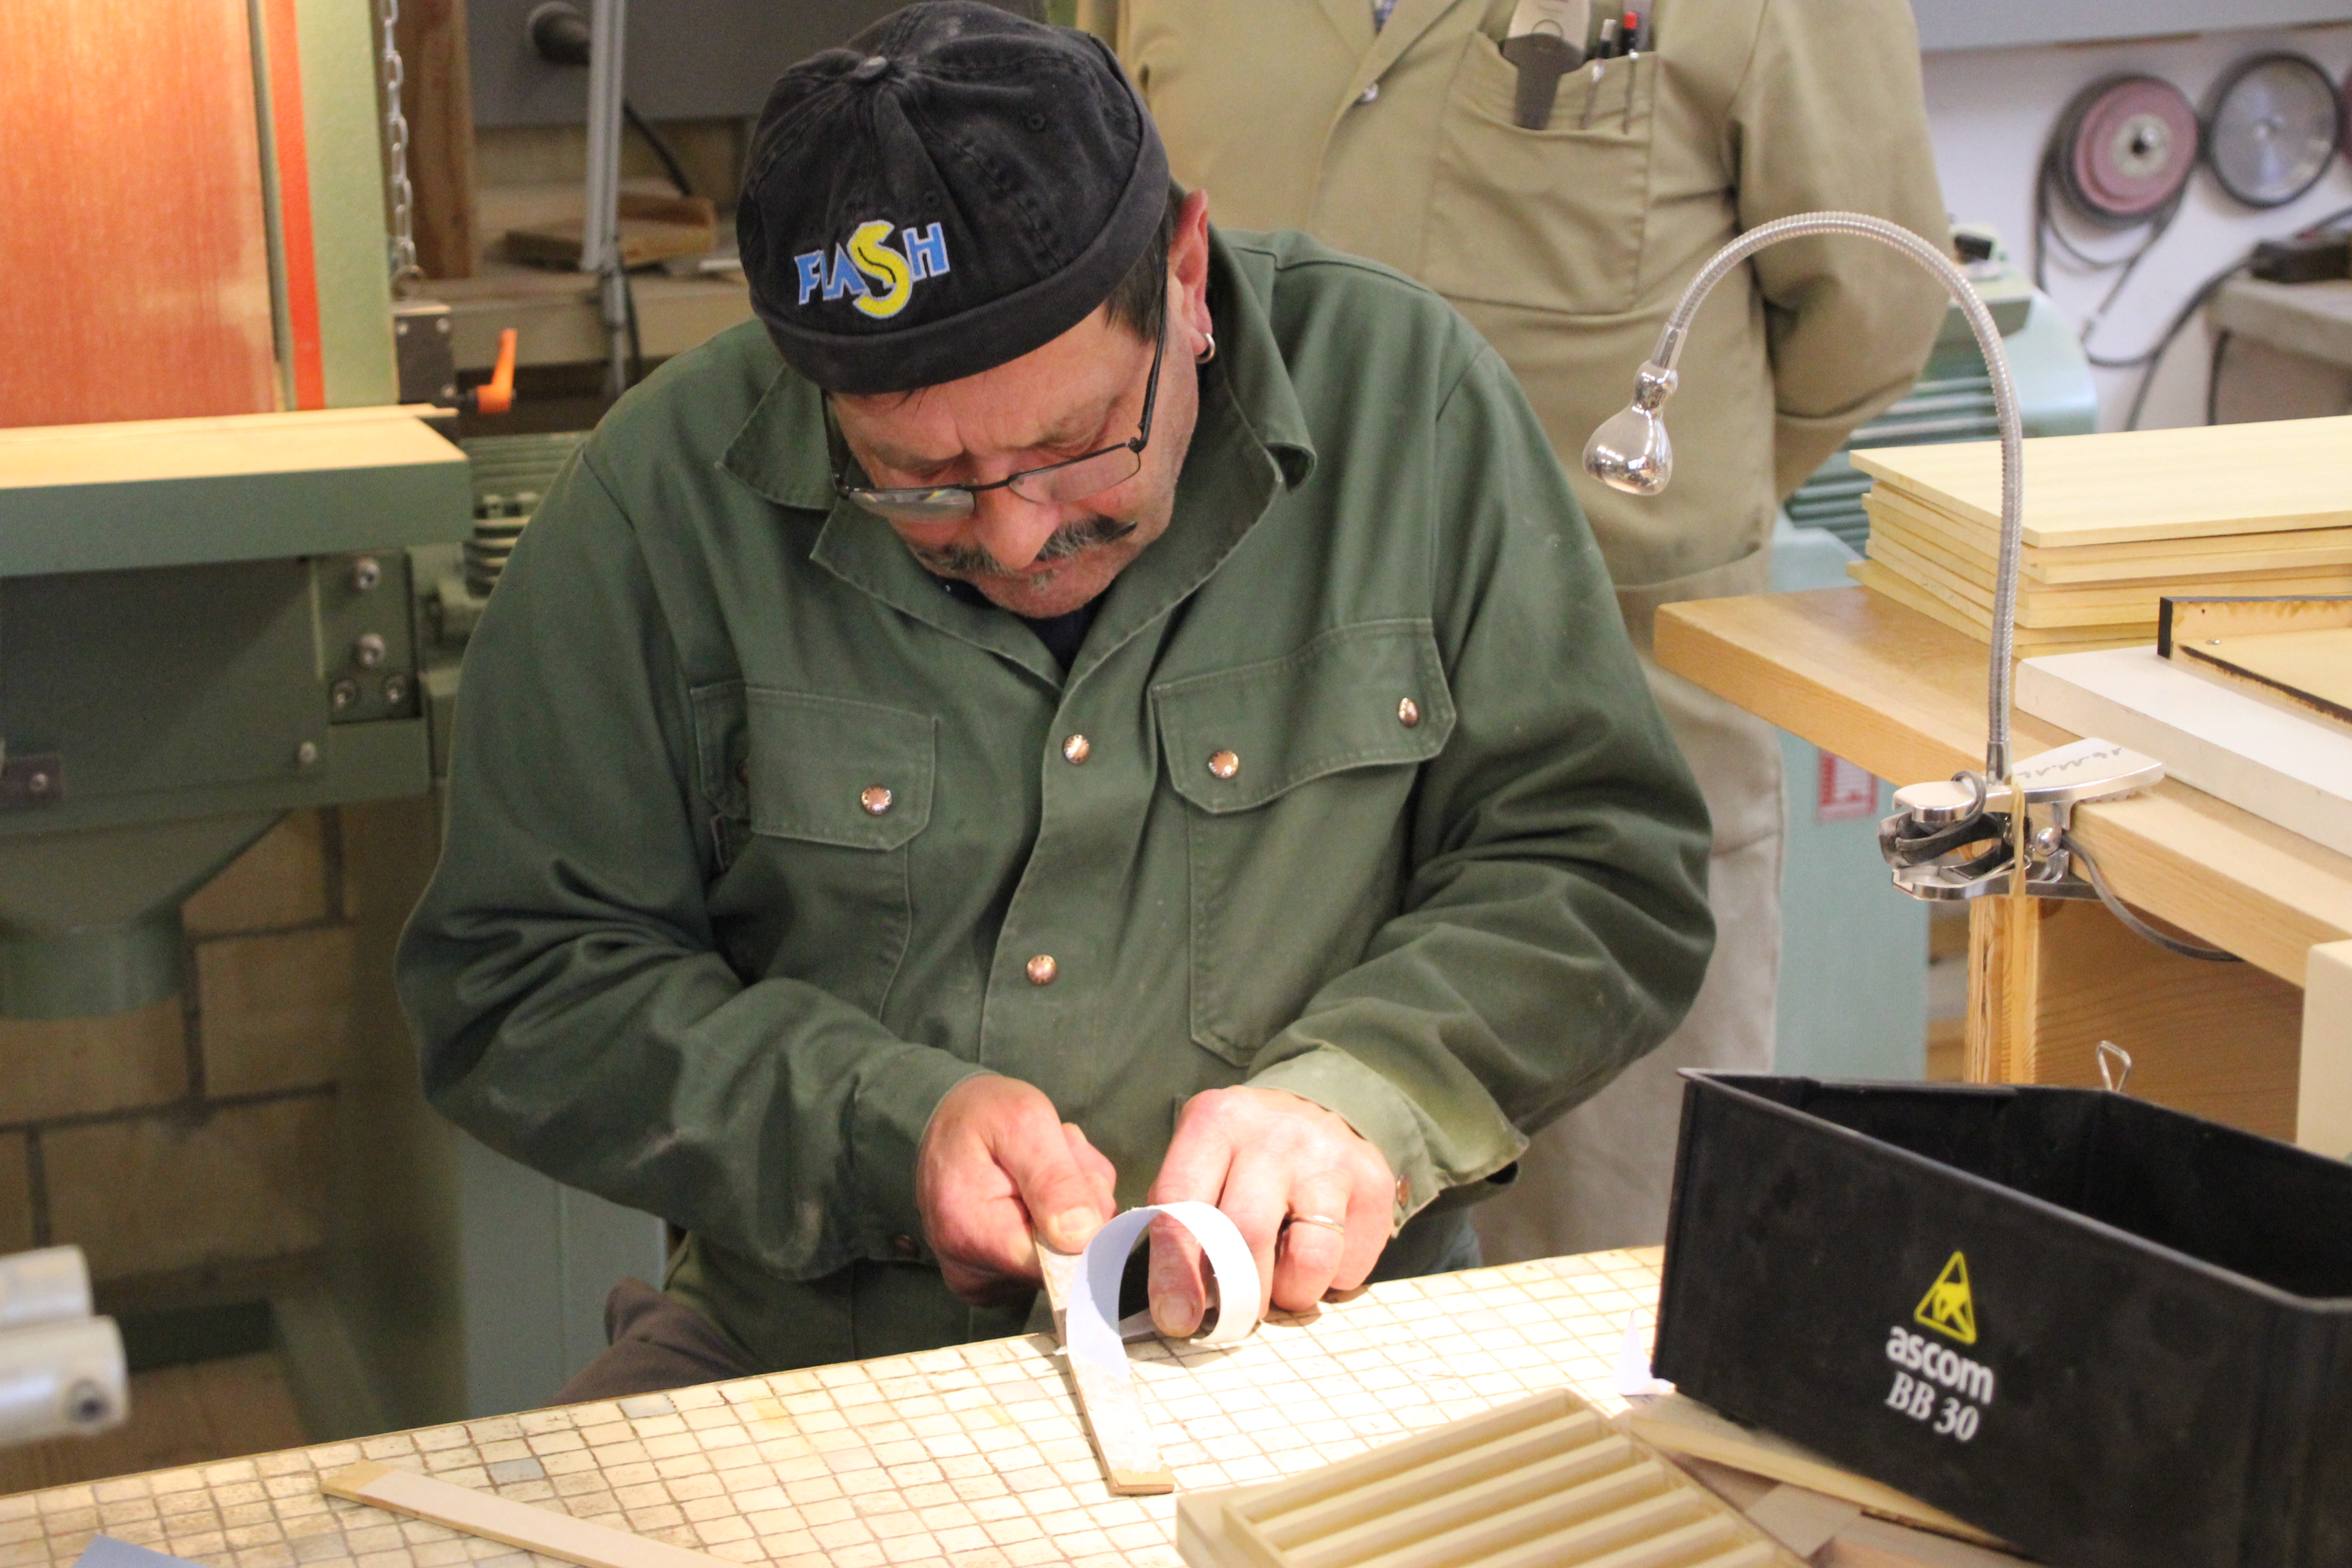 staff member cutting wood copyright Wibke Carter